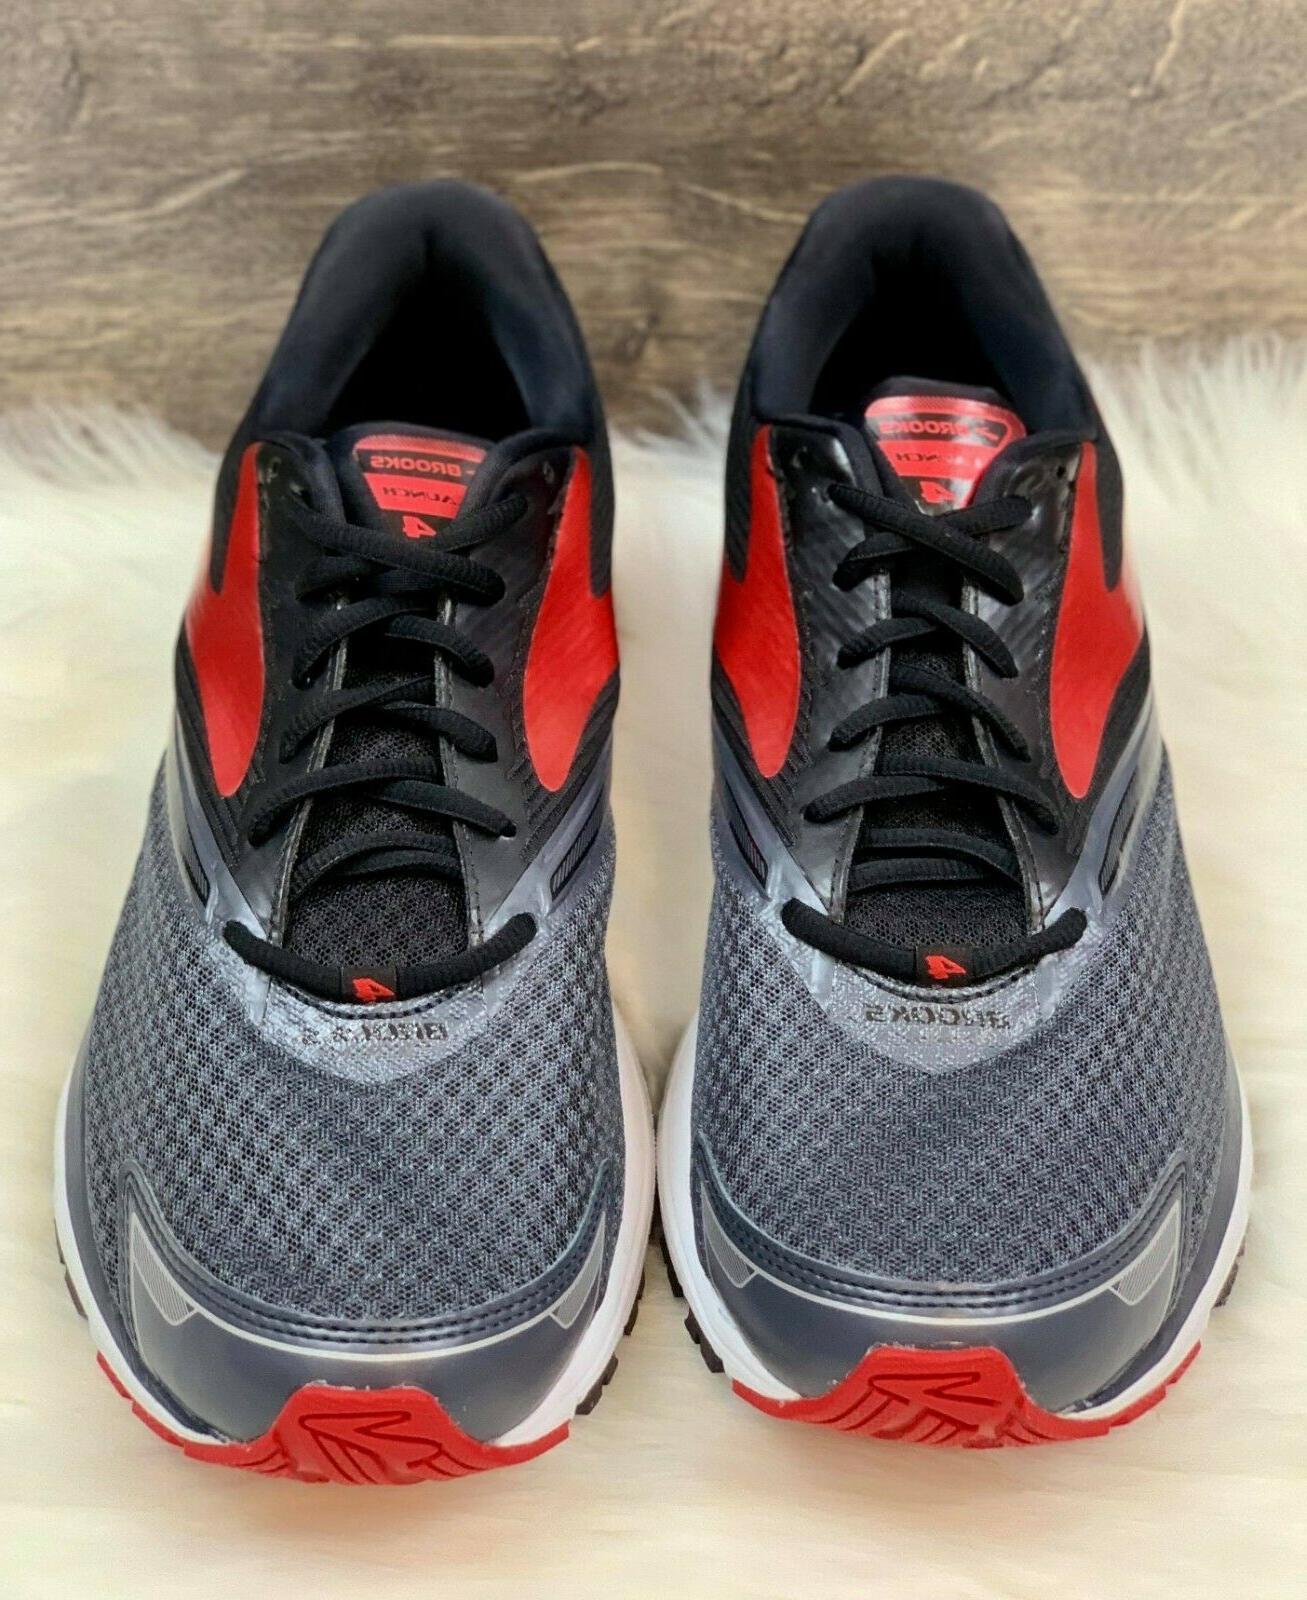 Brooks Men's 4 Running Shoes Size 12